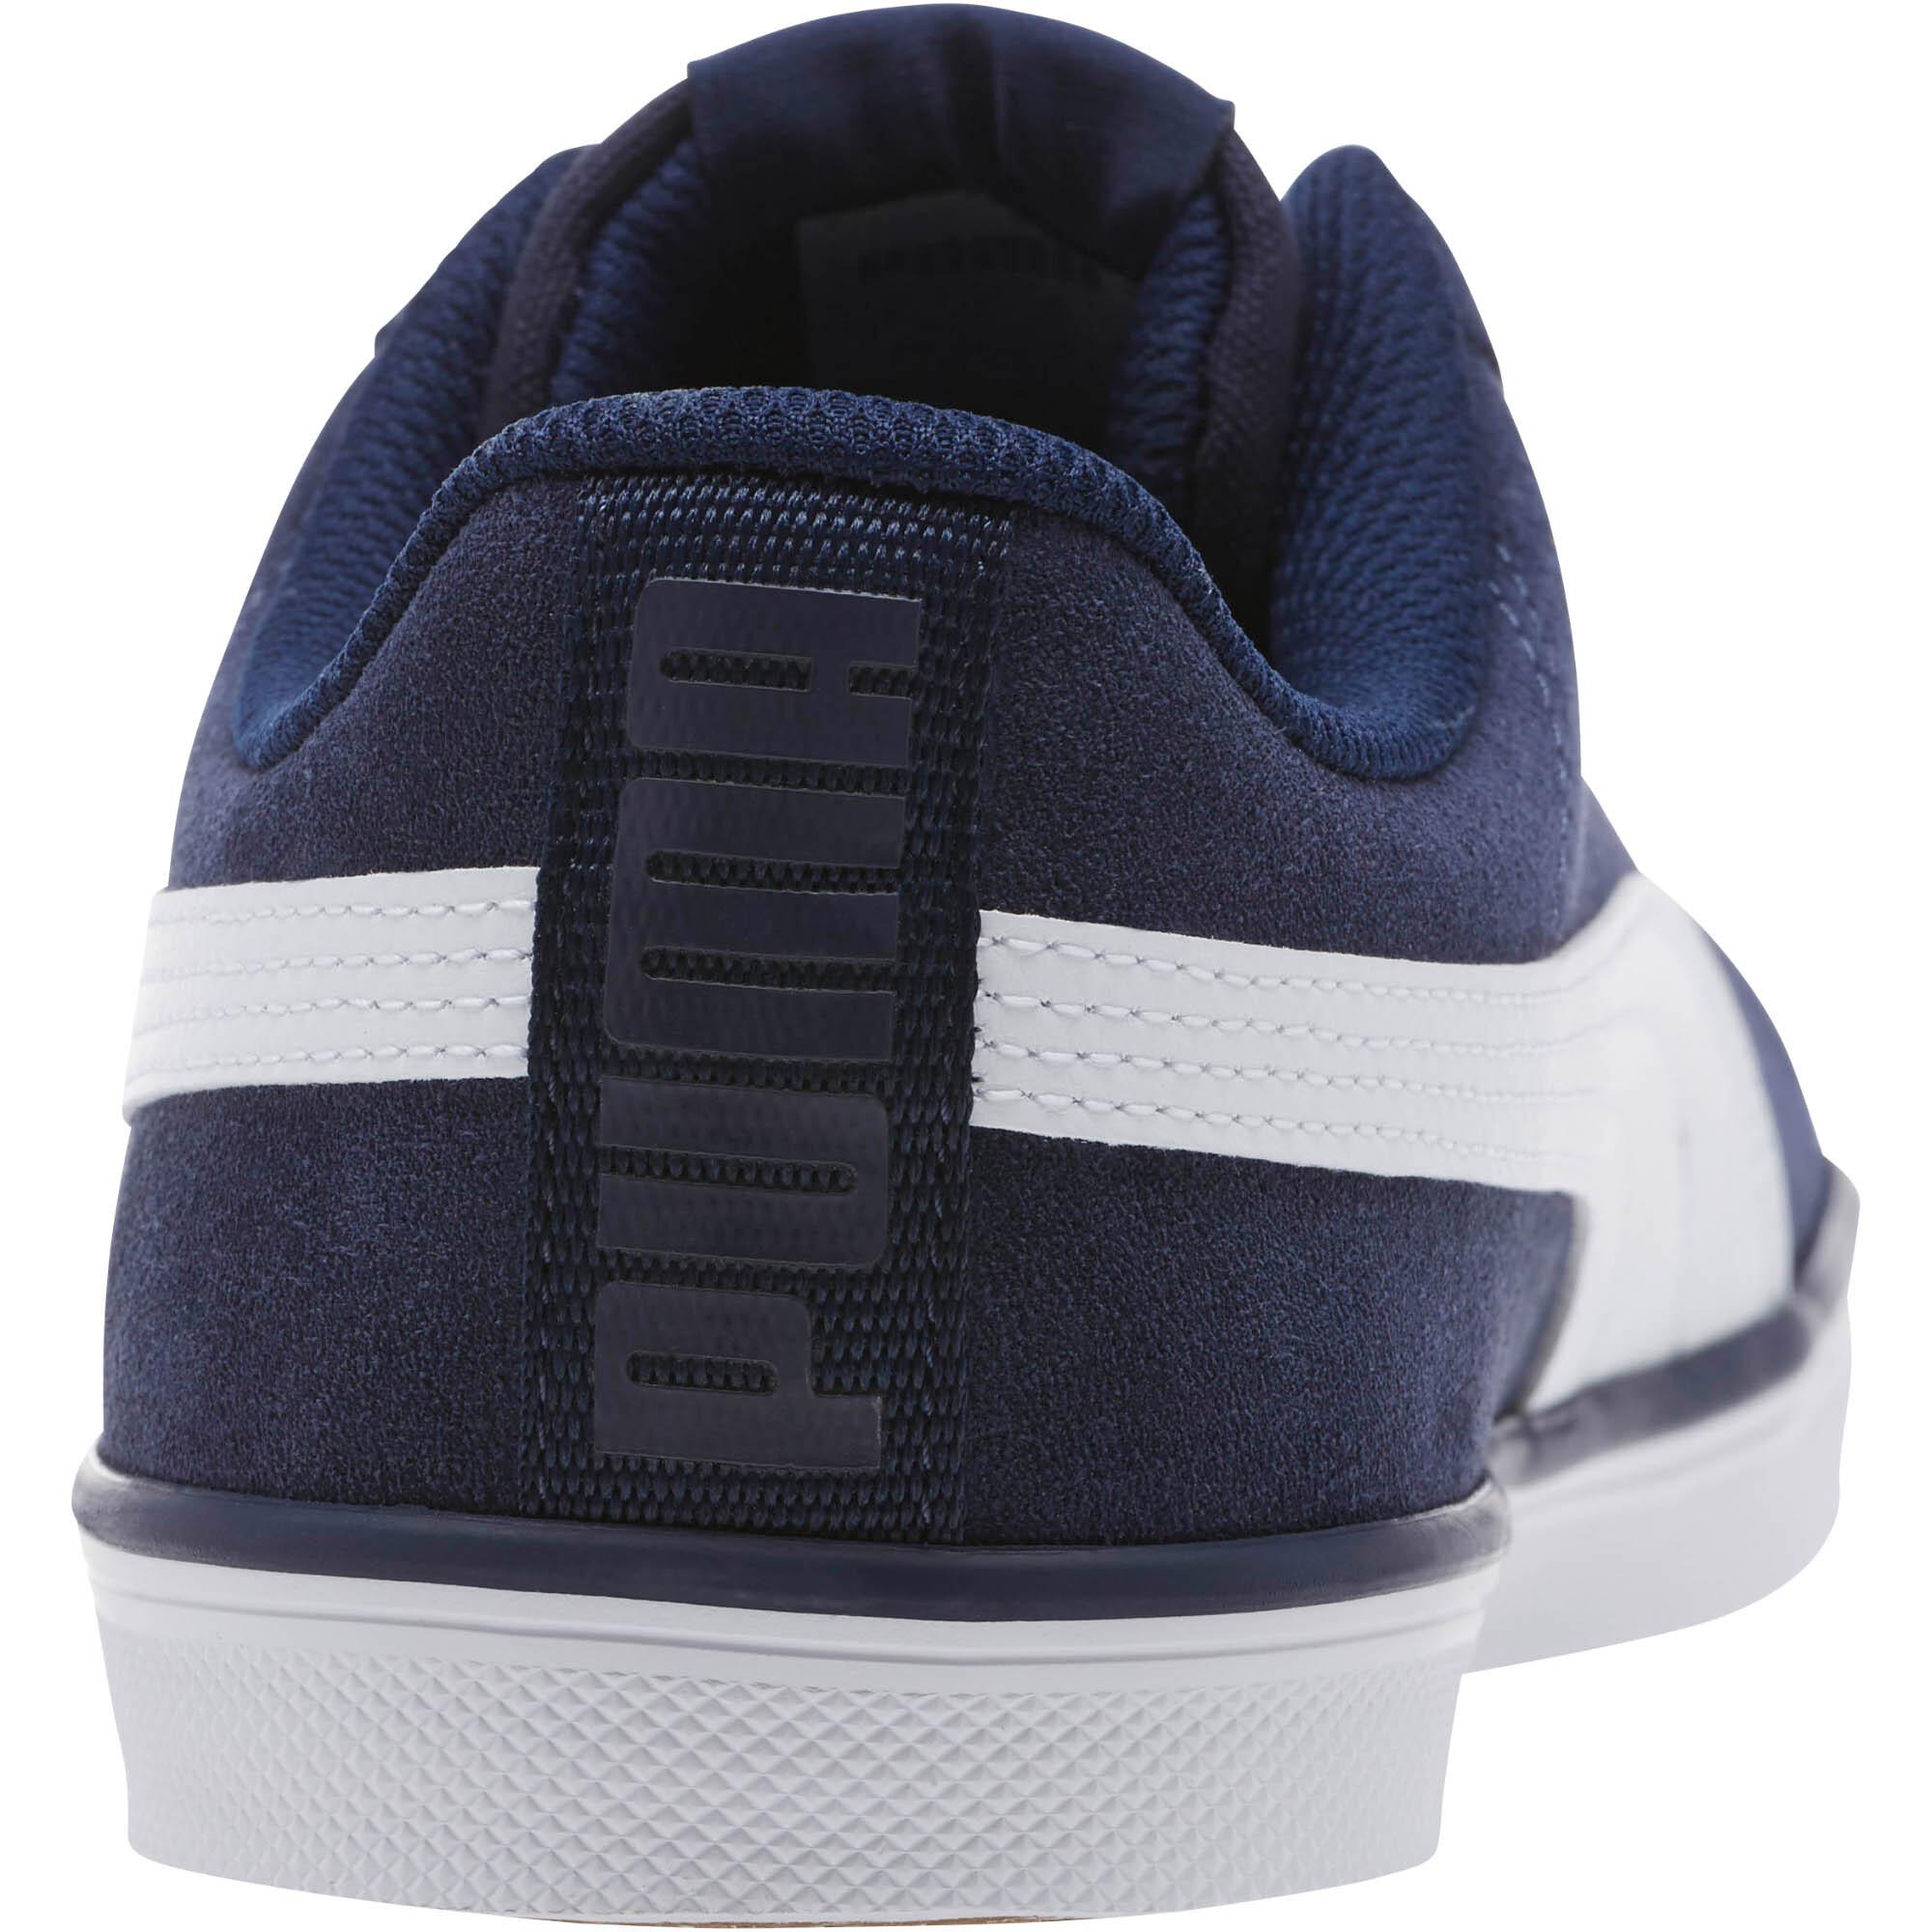 PUMA-Urban-Plus-Suede-Sneakers-Men-Shoe-Basics thumbnail 21